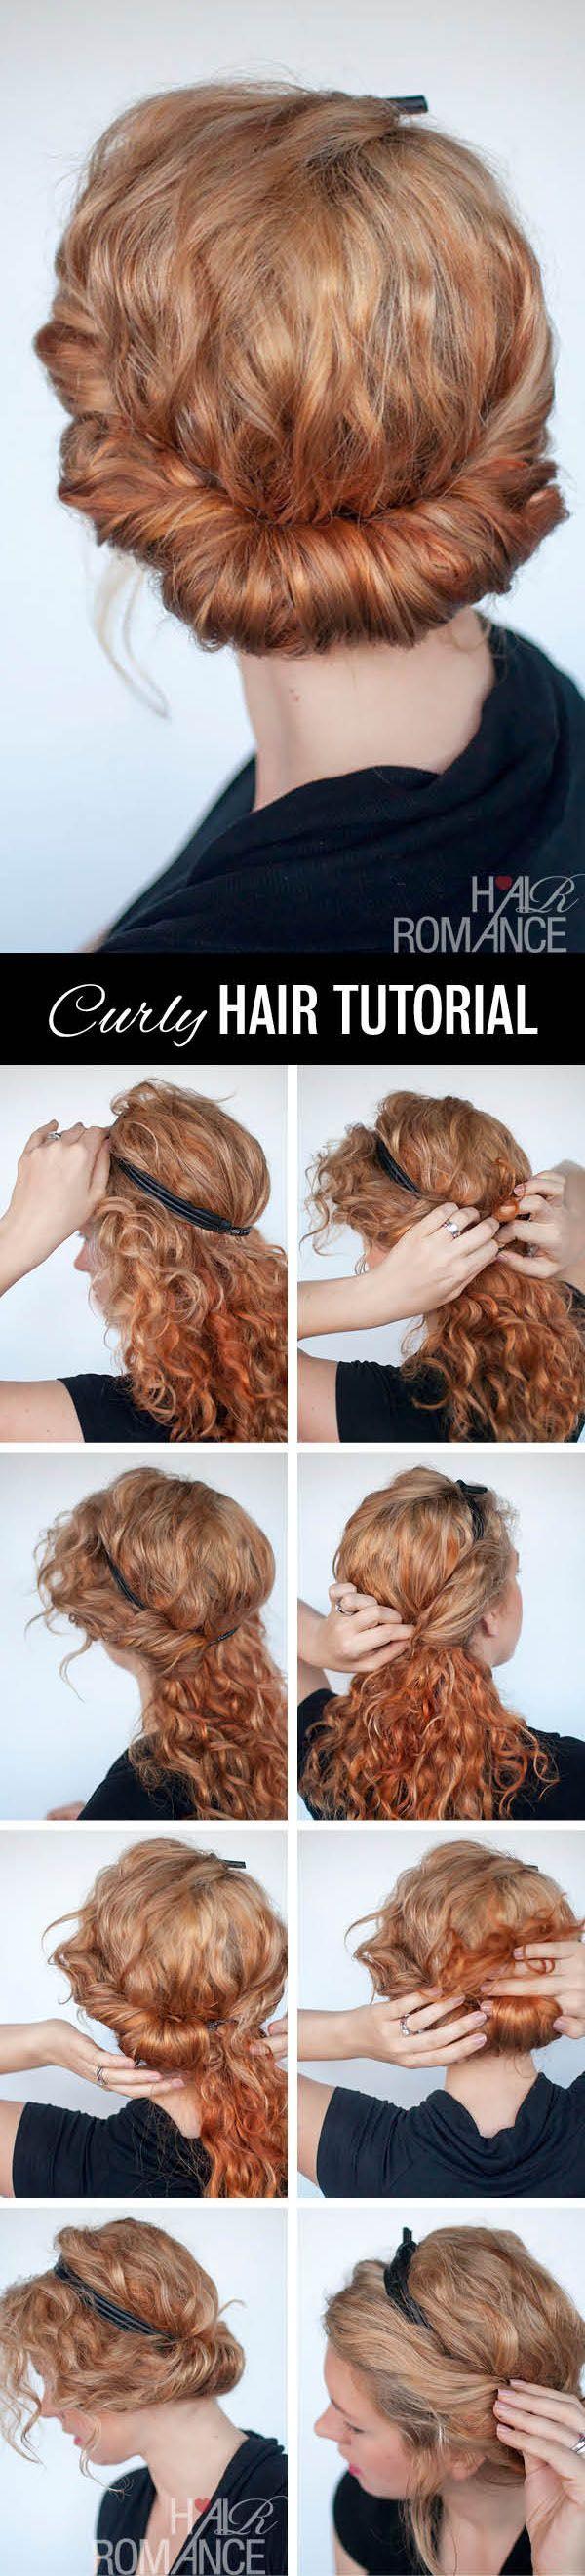 Tuto coiffure headband cheveux bouclés coiffures pinterest